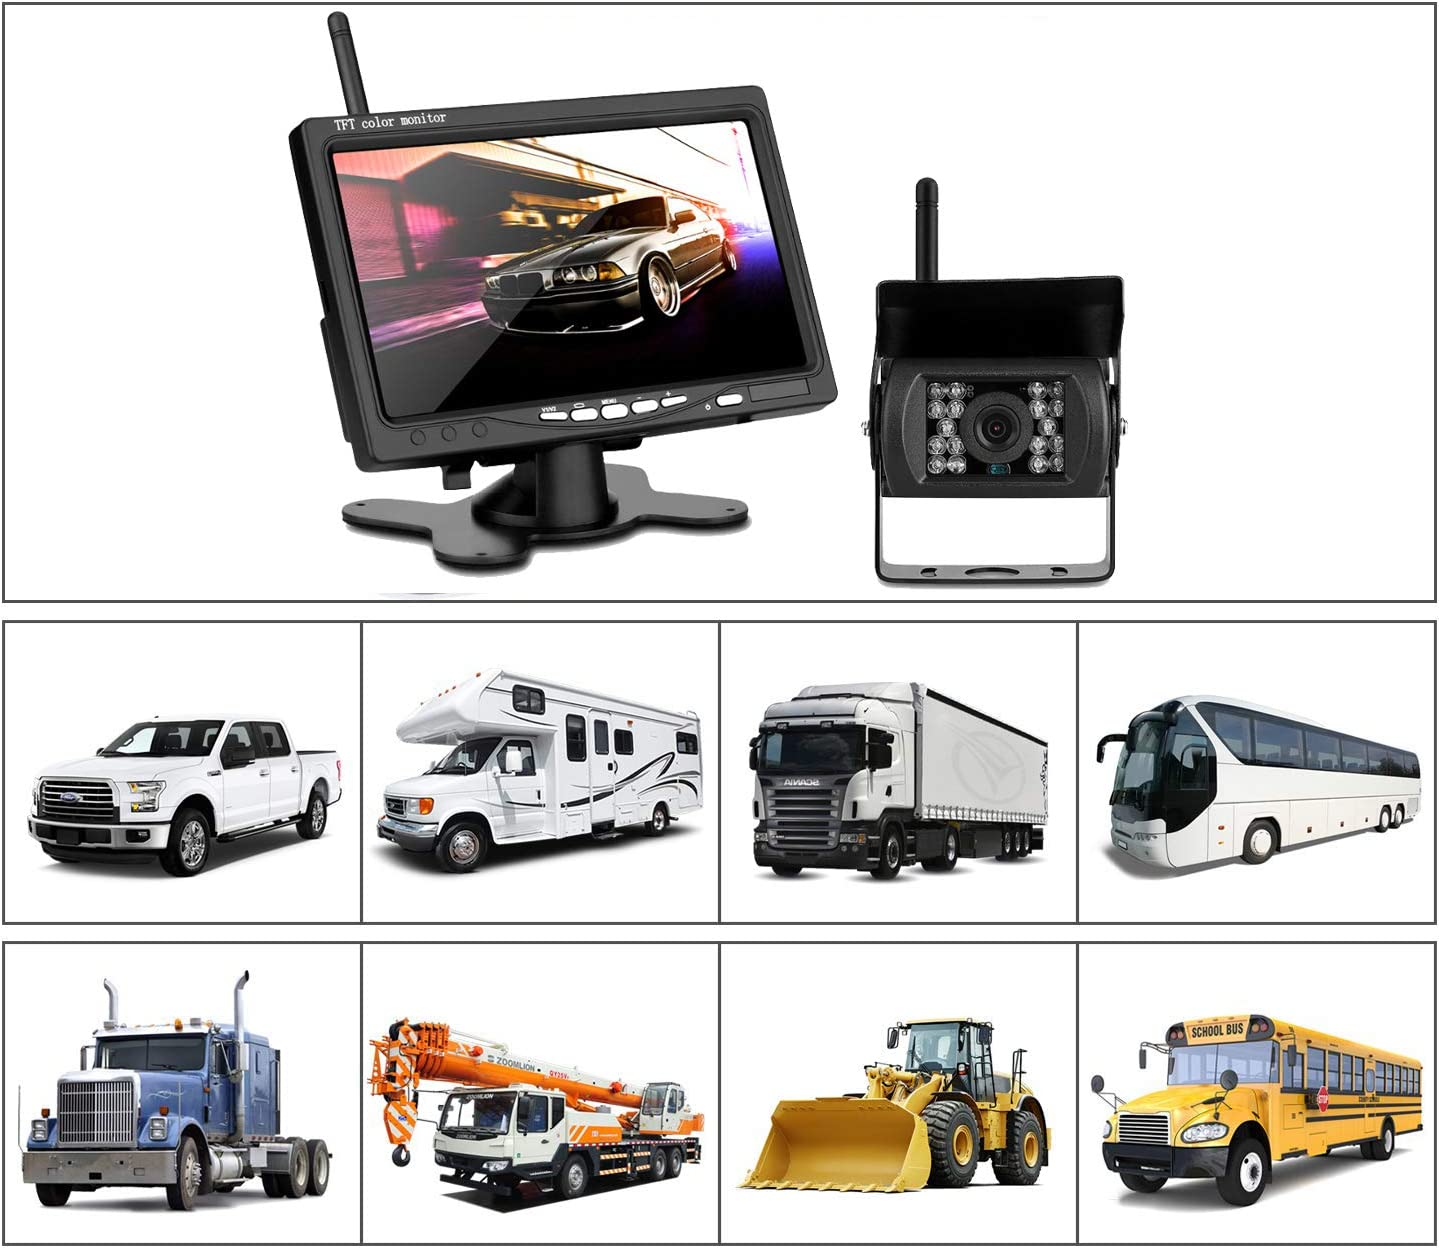 Vehicle Backup Camera Monitor Kit UKSoku Rearview Reversing Camera Wireless 7 TFT LCD IP67 Waterproof Night Vision Split Screen 270/° Wide Angle for Bus RV Truck Box Semi-Trailer